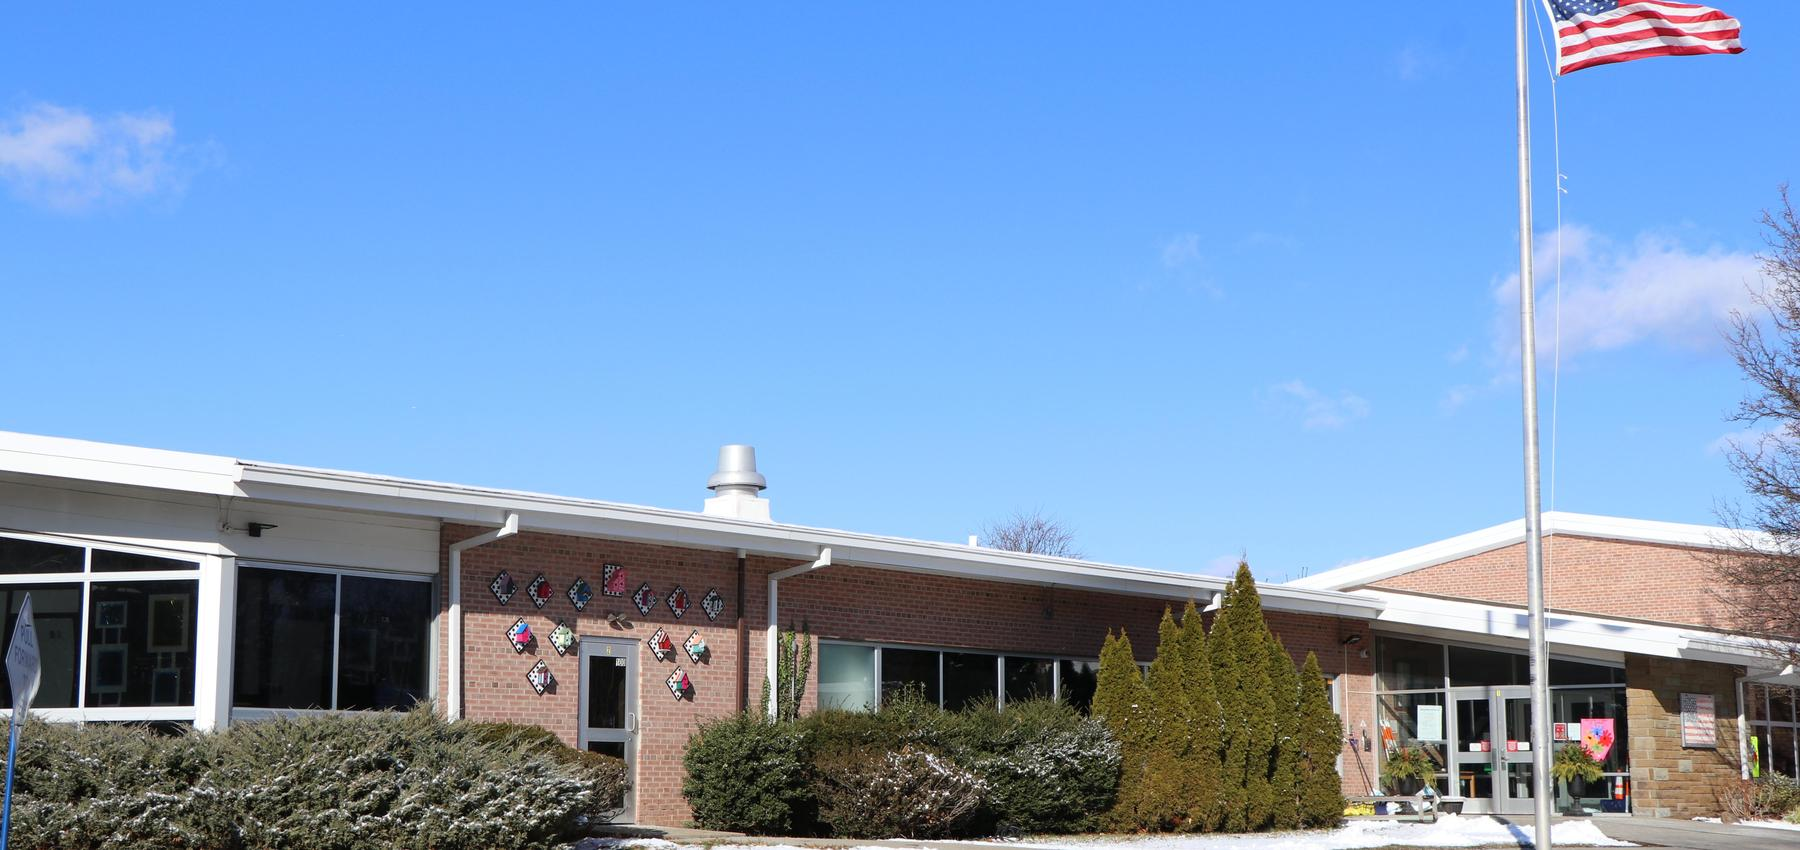 Hartshorn Elementary School, Millburn